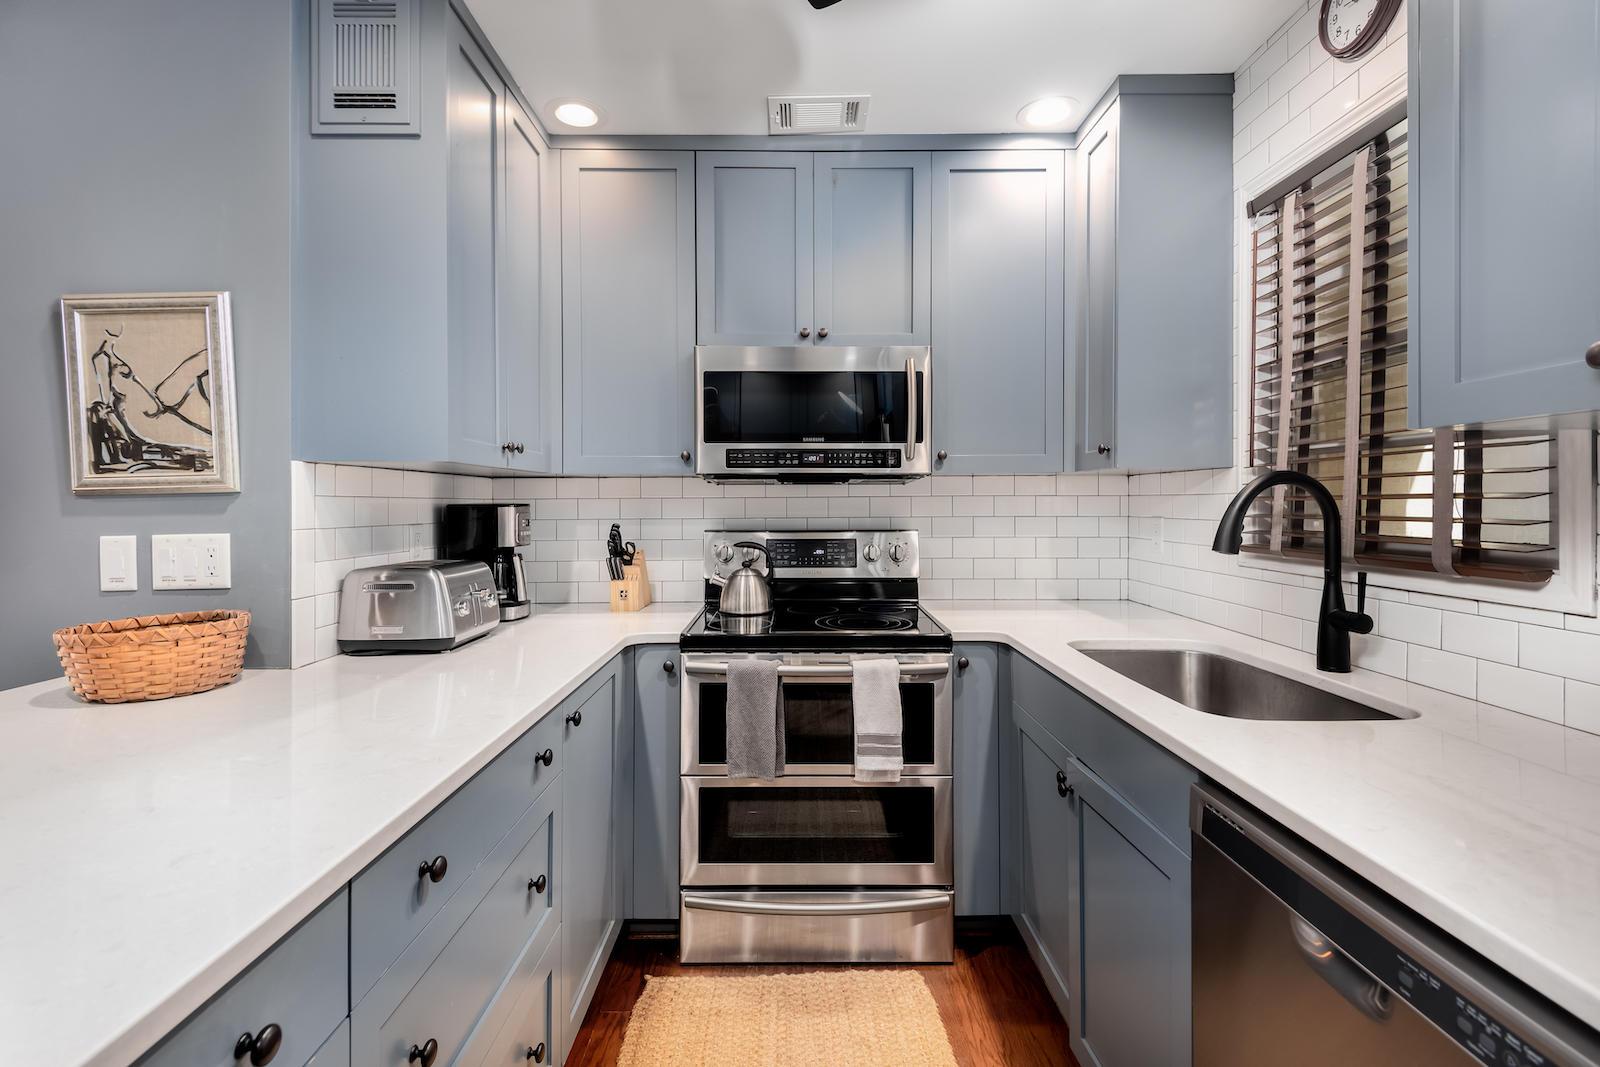 Harleston Village Homes For Sale - 15 Horlbeck, Charleston, SC - 1